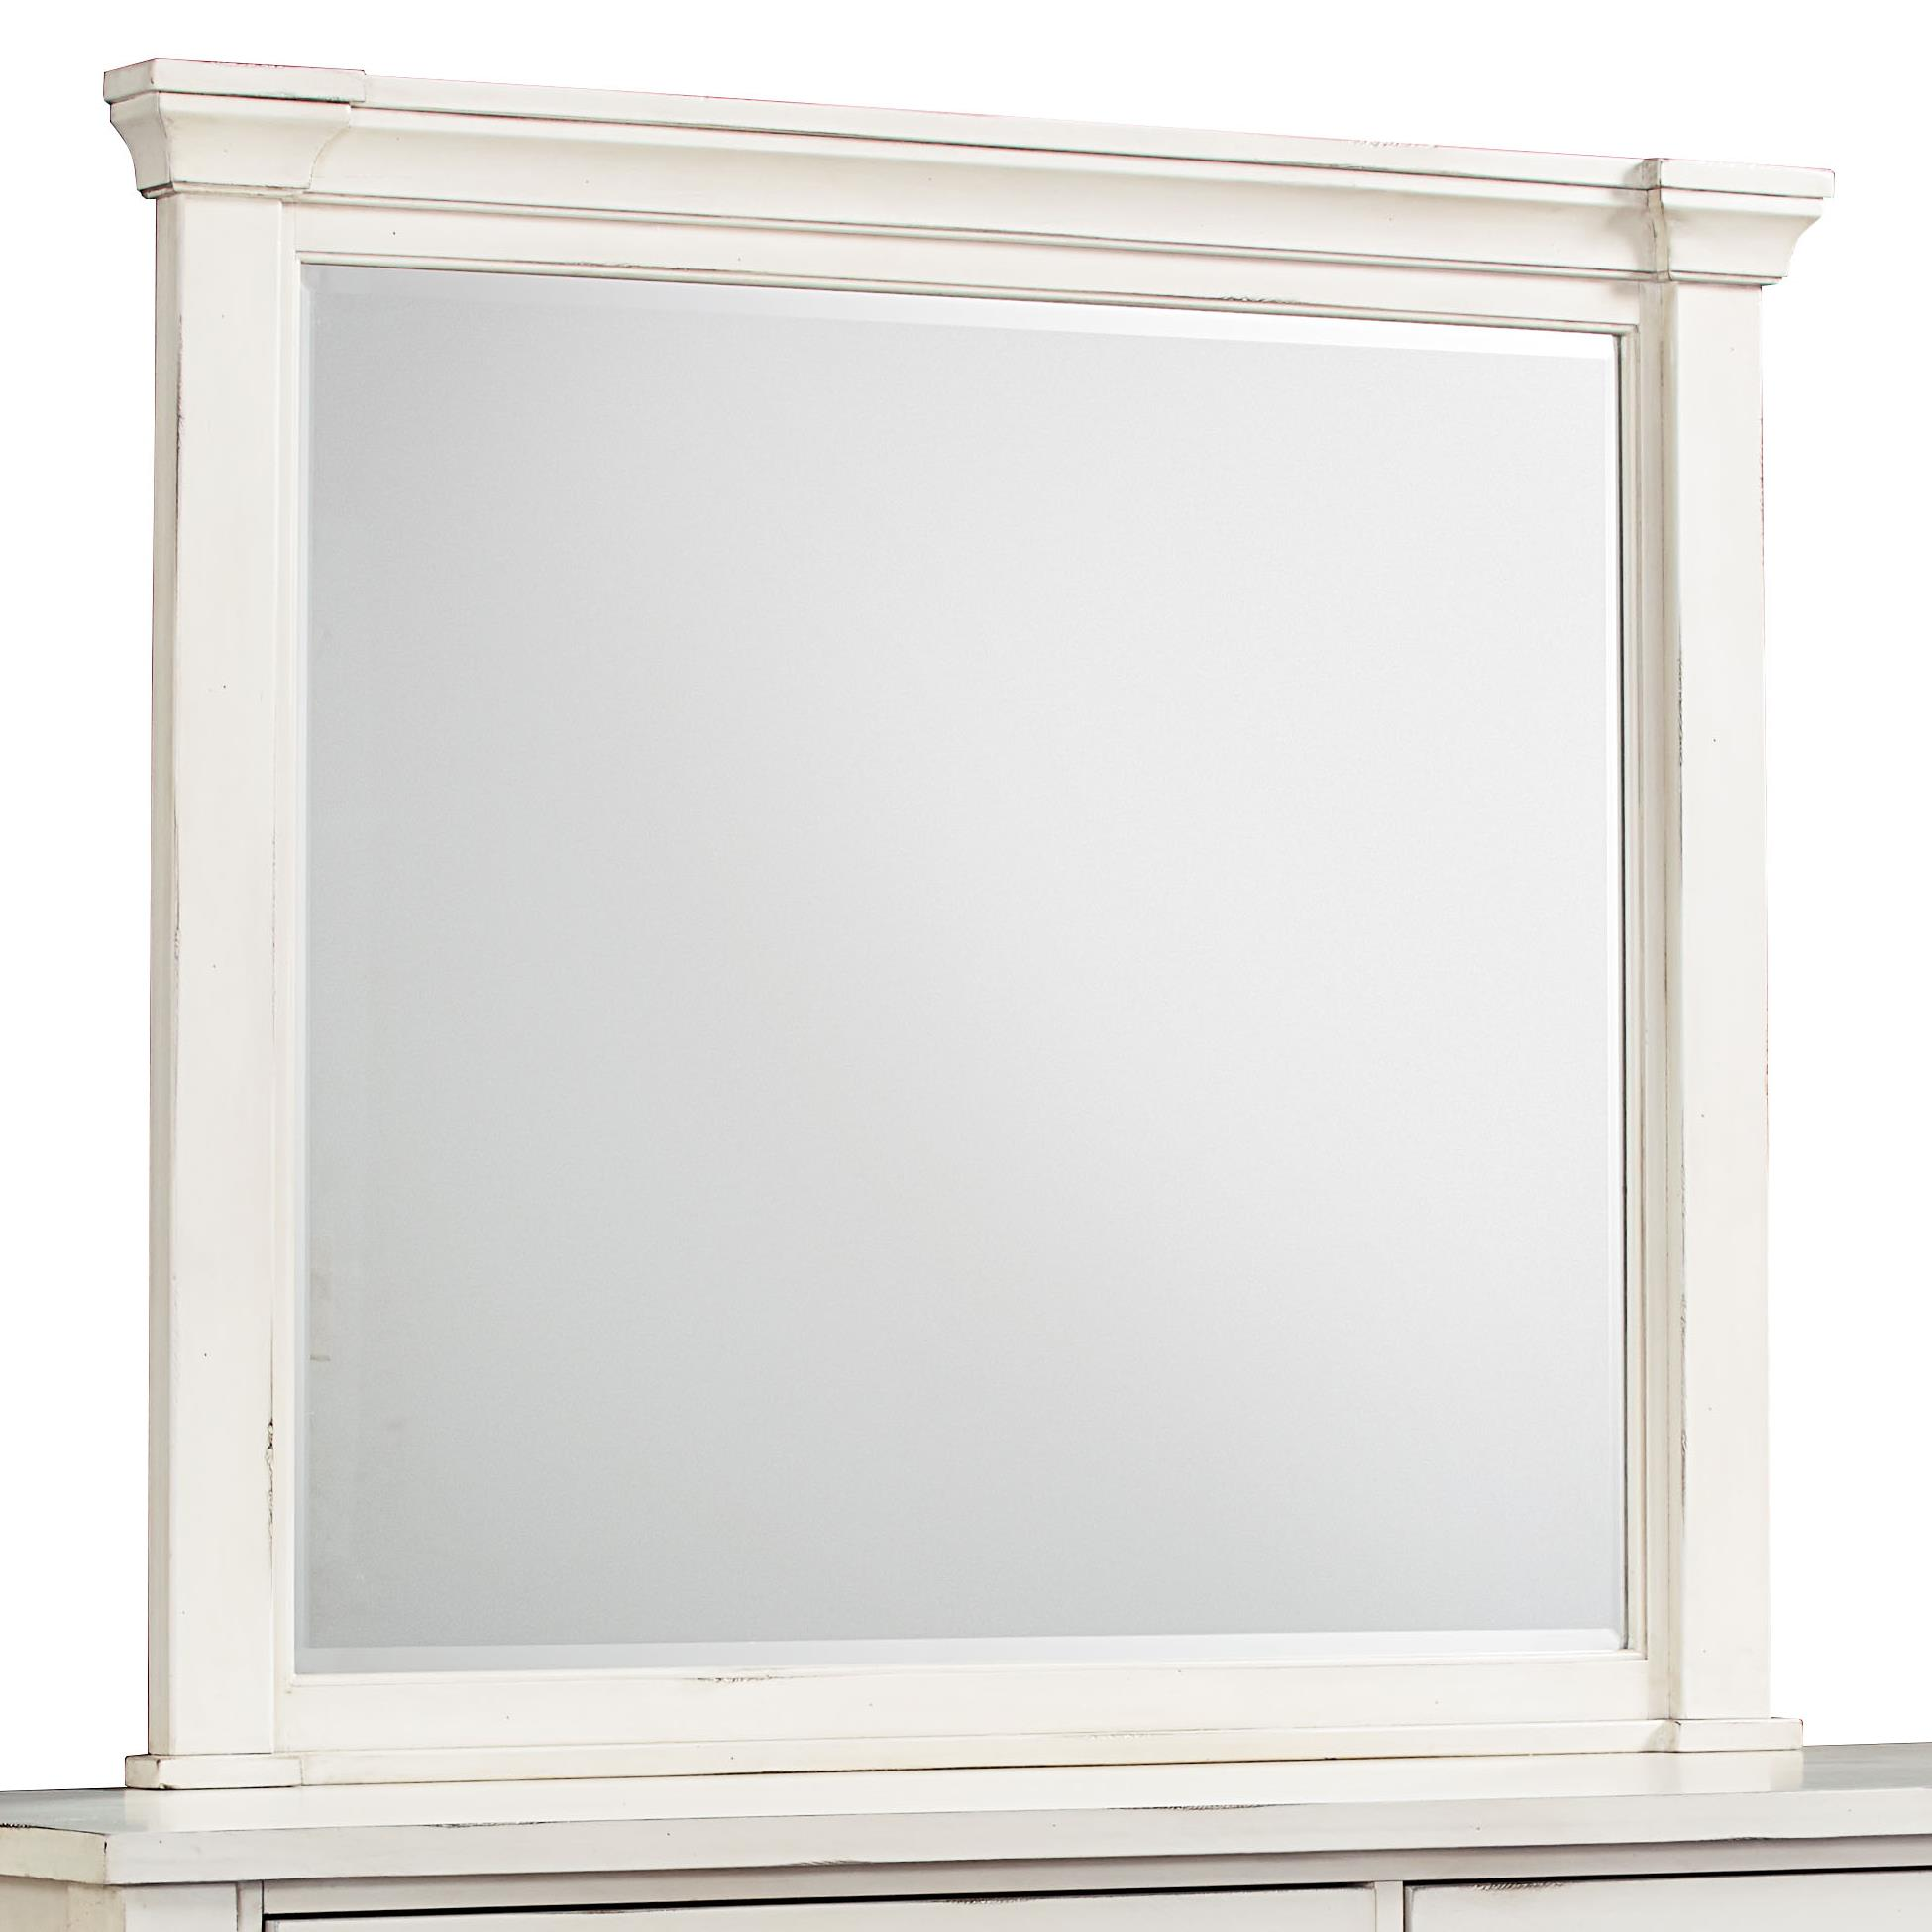 Standard Furniture Chesapeake Bay Mirror                                   - Item Number: 91608